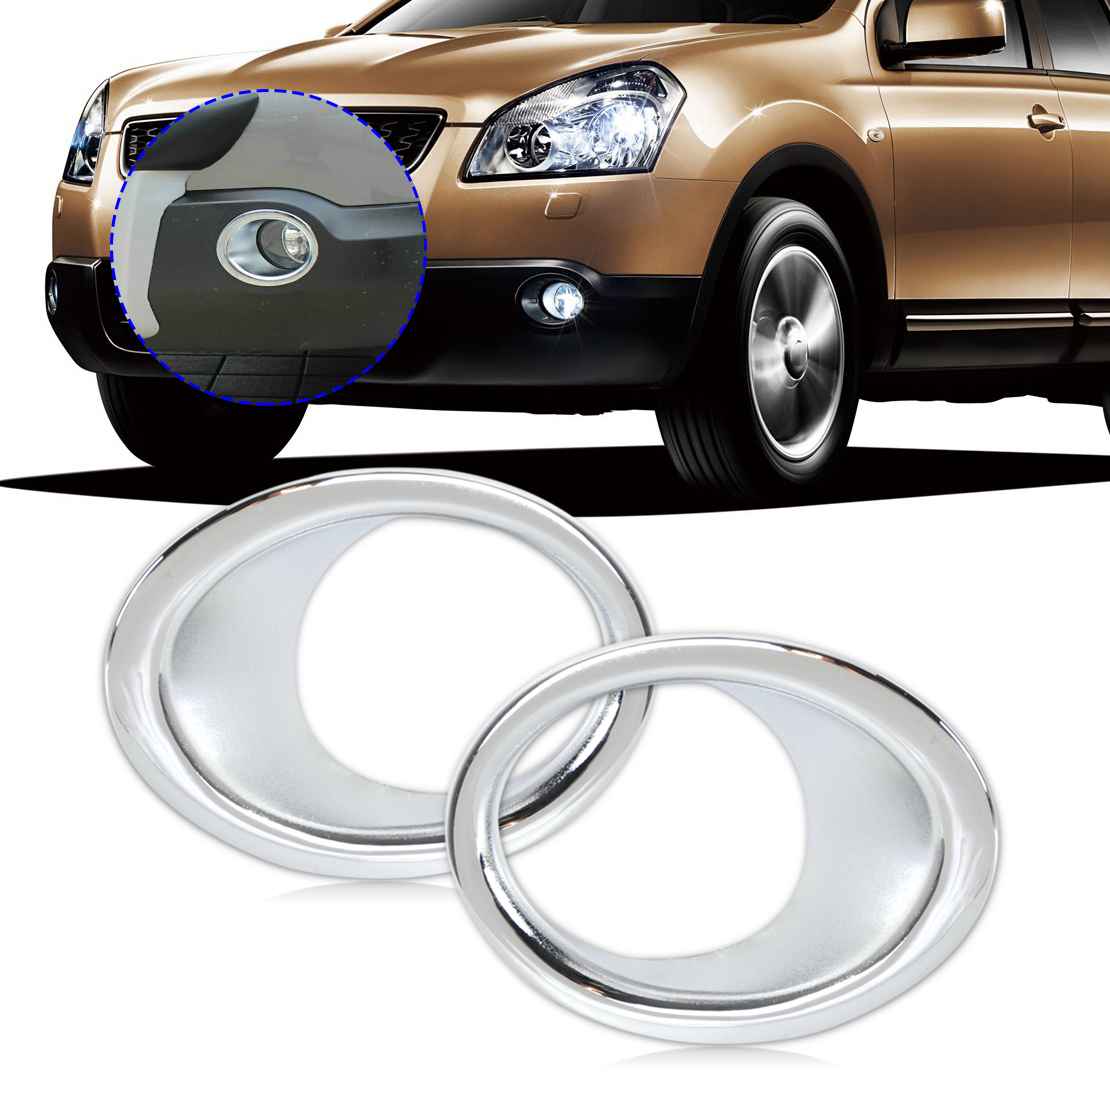 beler 2pcs ABS Plastics Chrome Front Fog Lights font b Lamp b font Mask Cover Molding